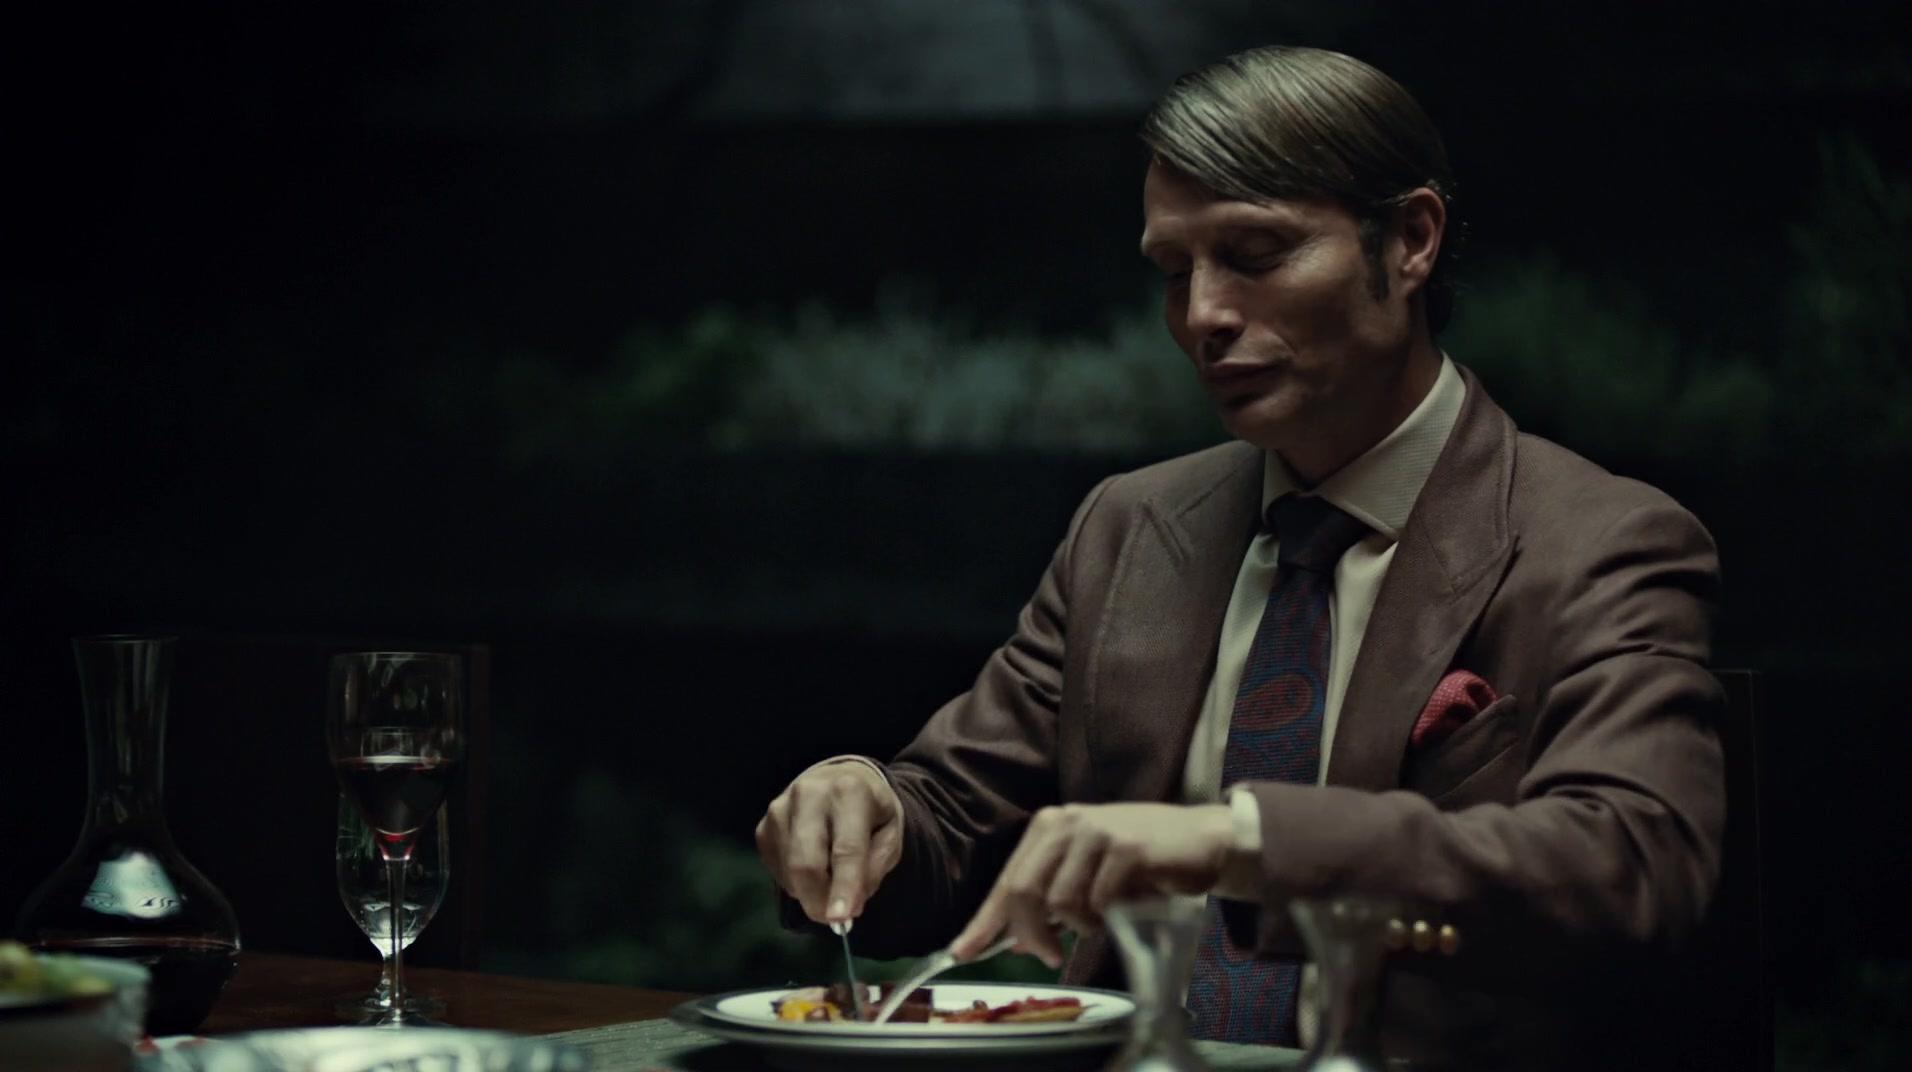 Mads Hannibal